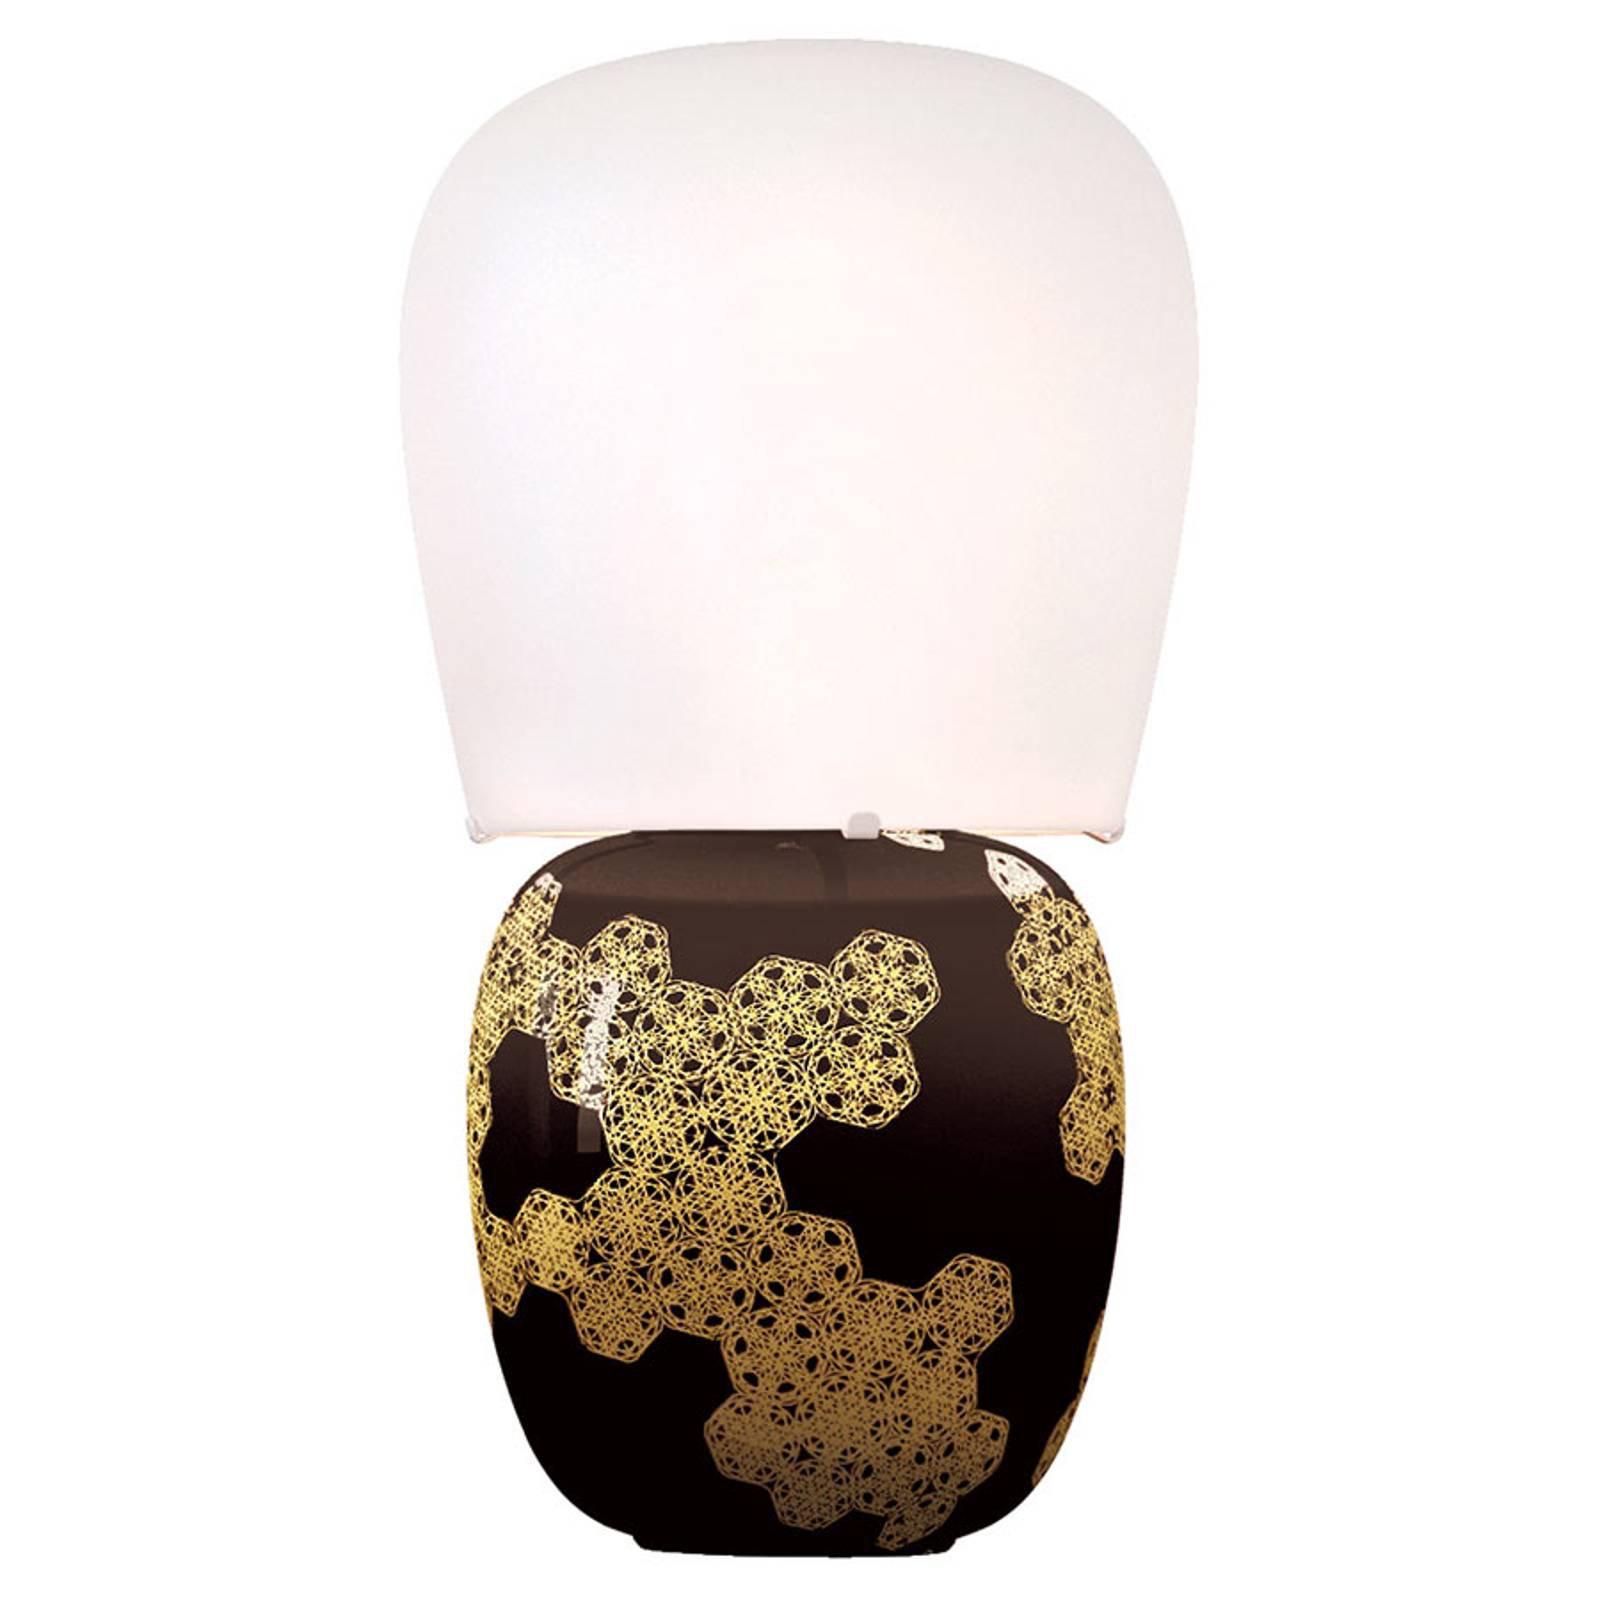 Kundalini Hive - keramisk bordlampe, svart